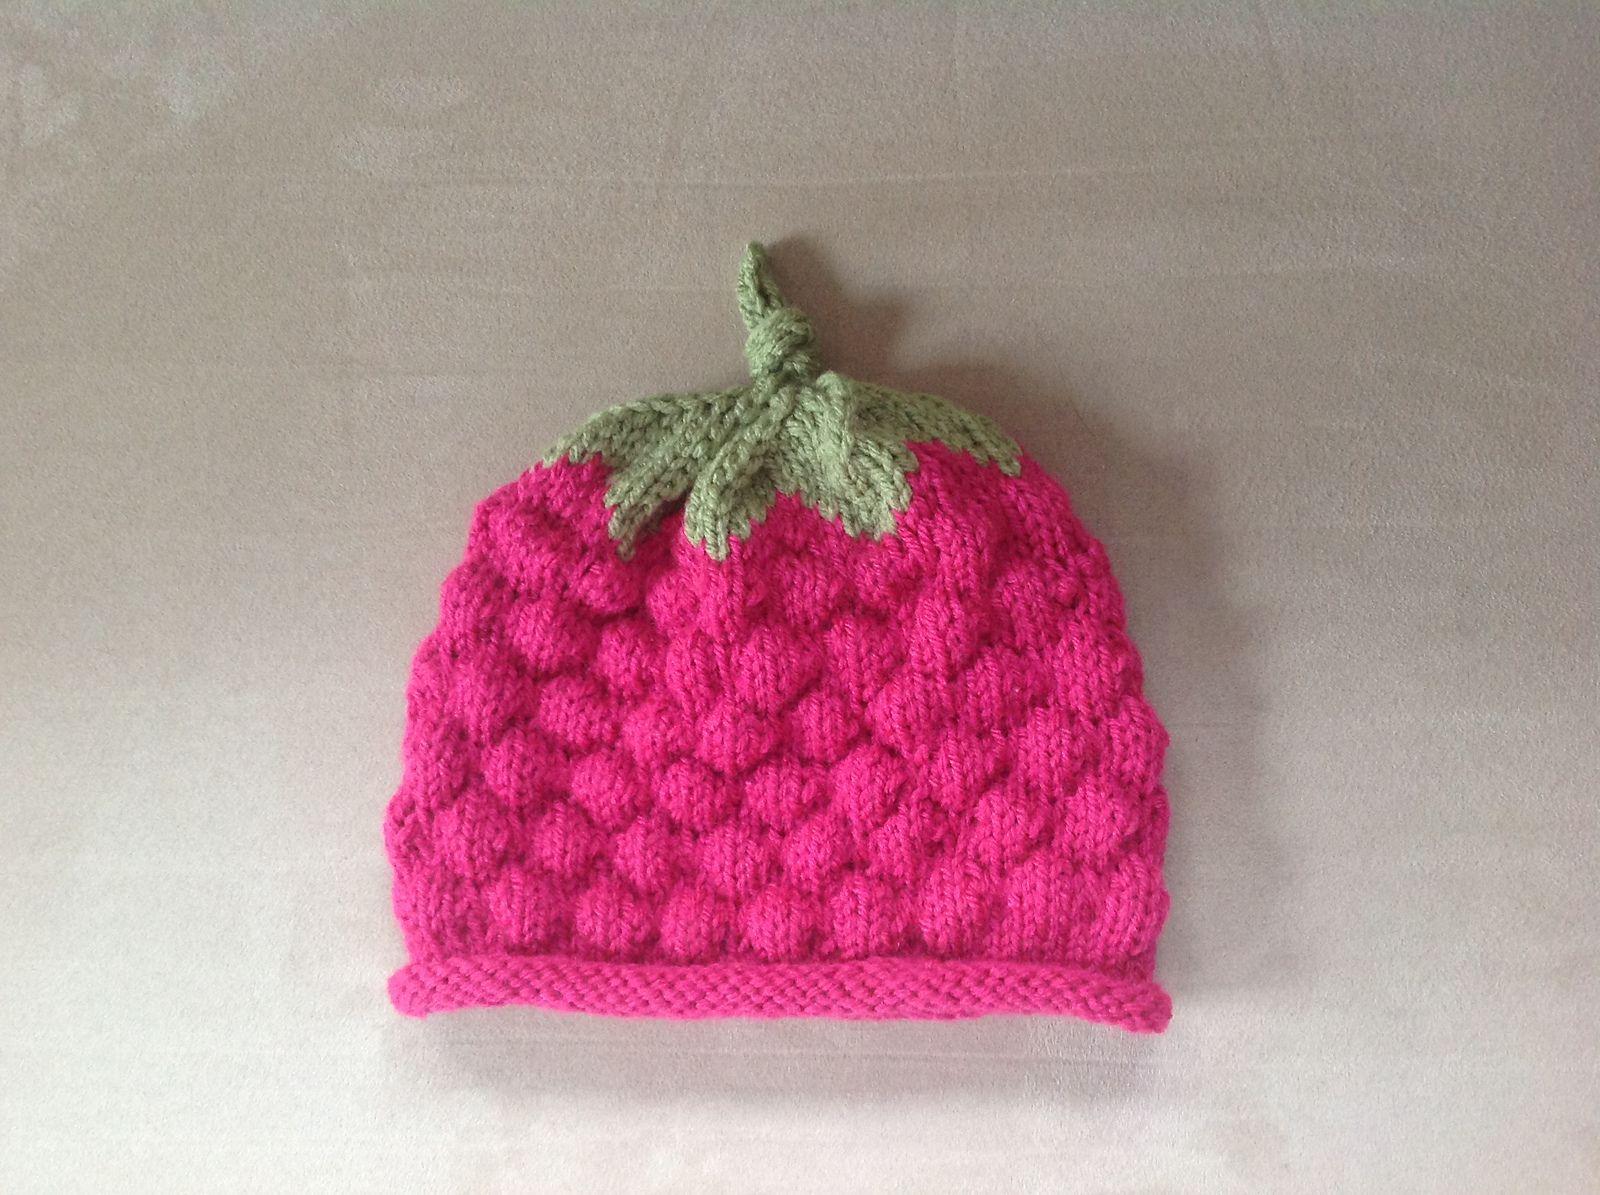 Ravelry: tatankagirl's Berry Baby Hat   Baby hat knitting ...